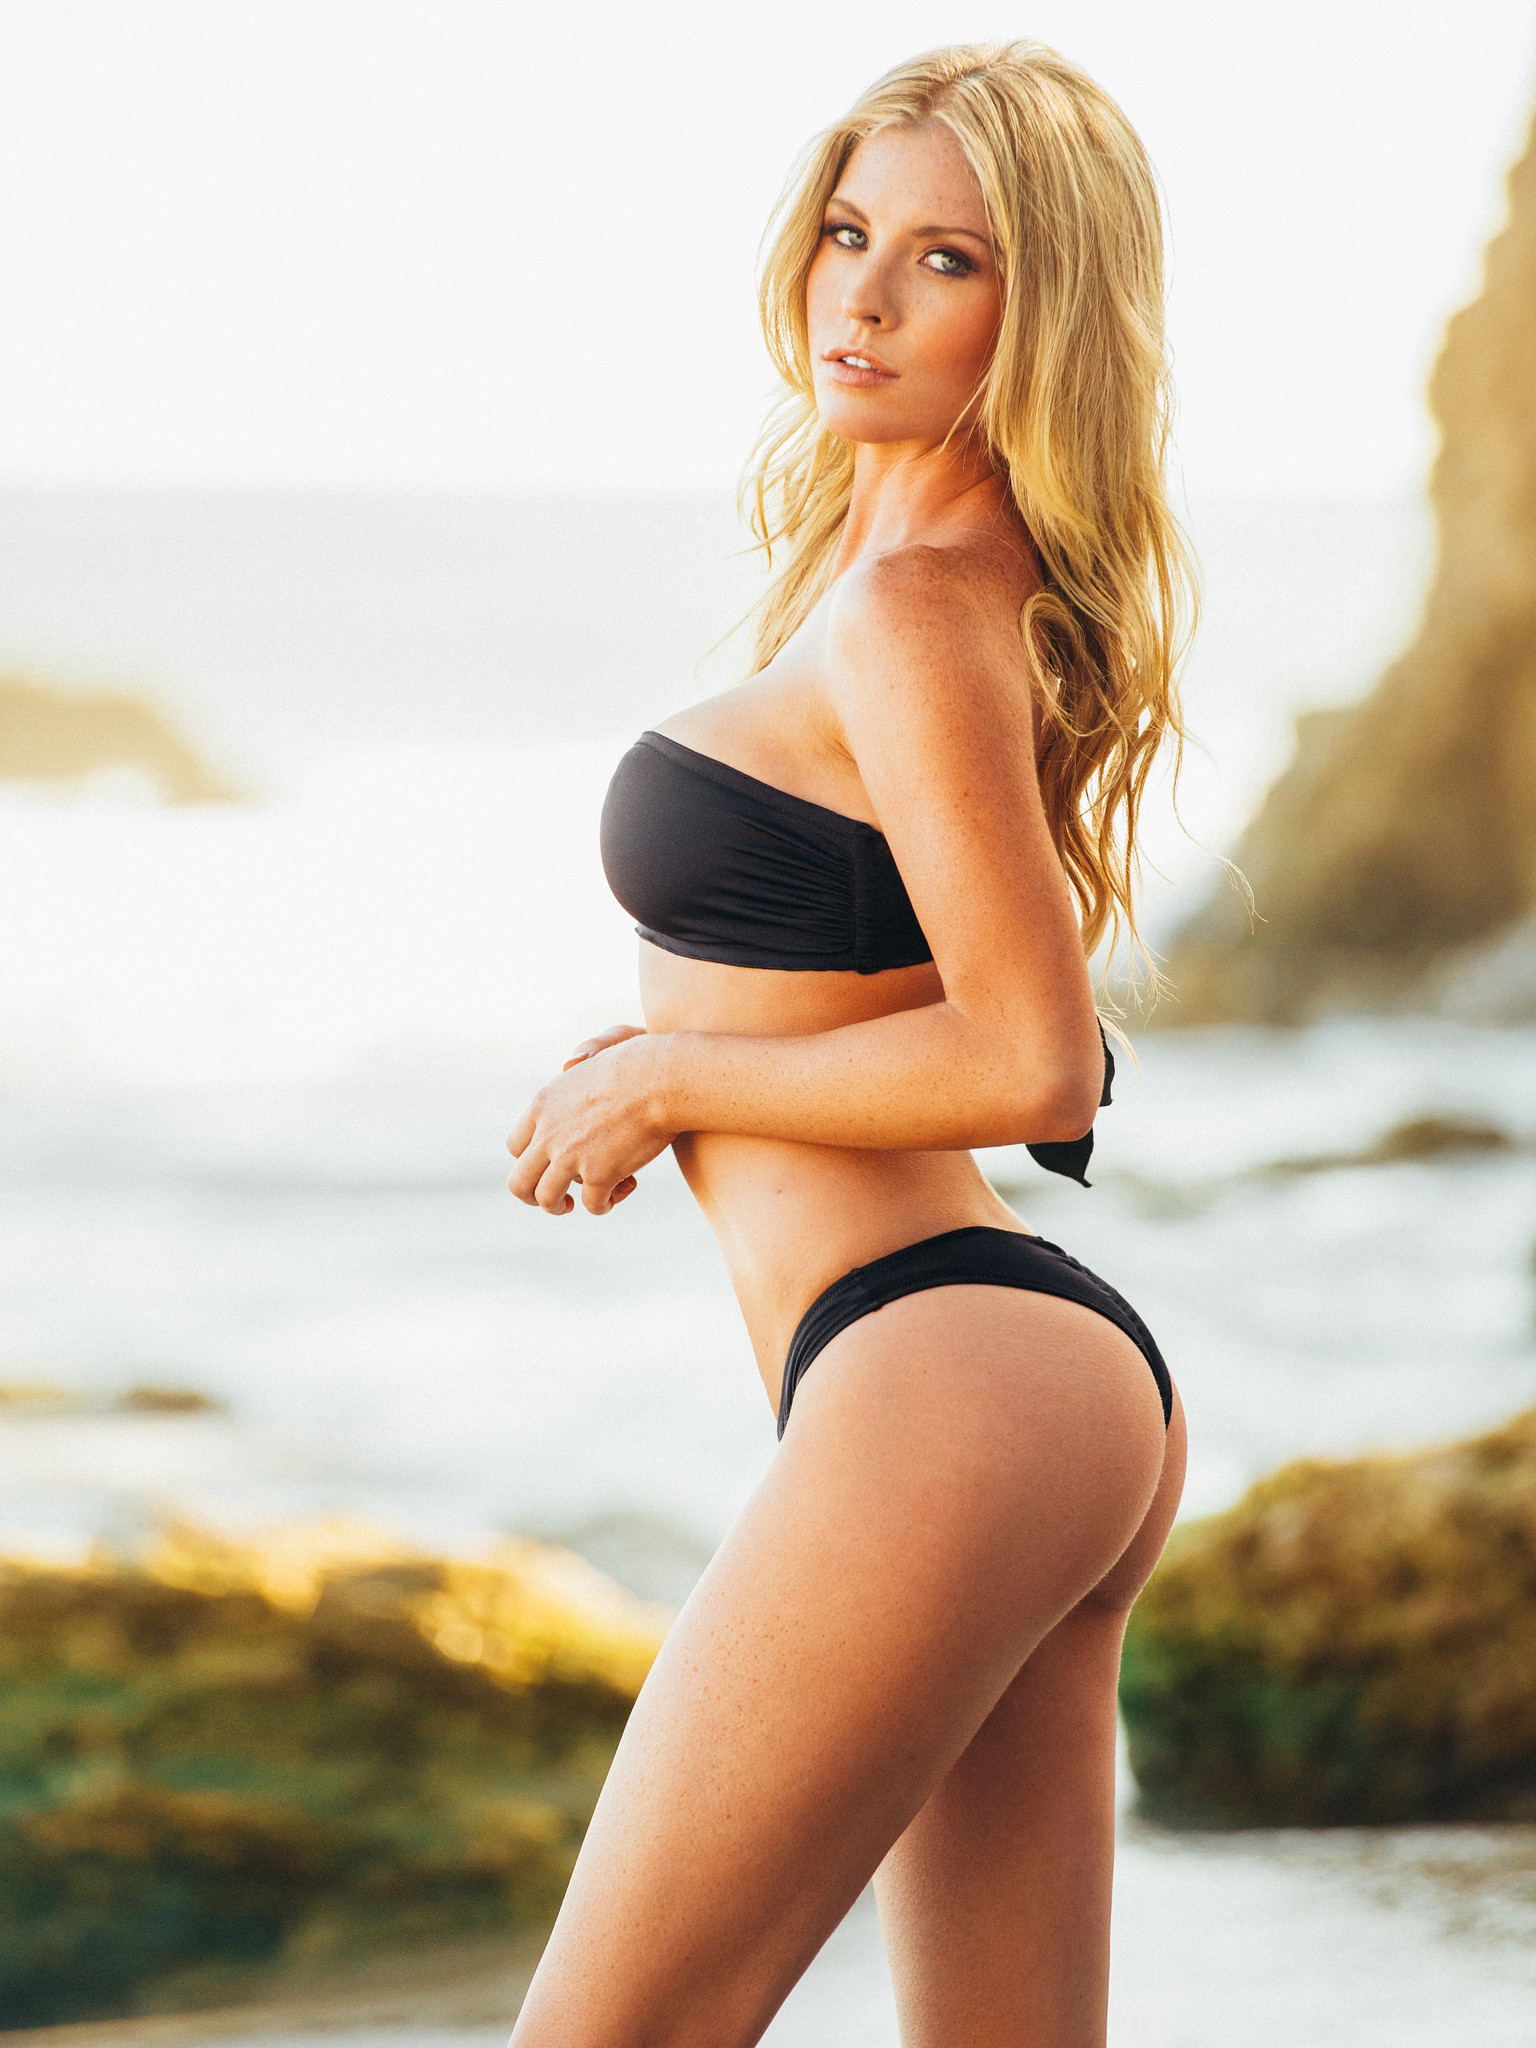 Hot Carly Lauren